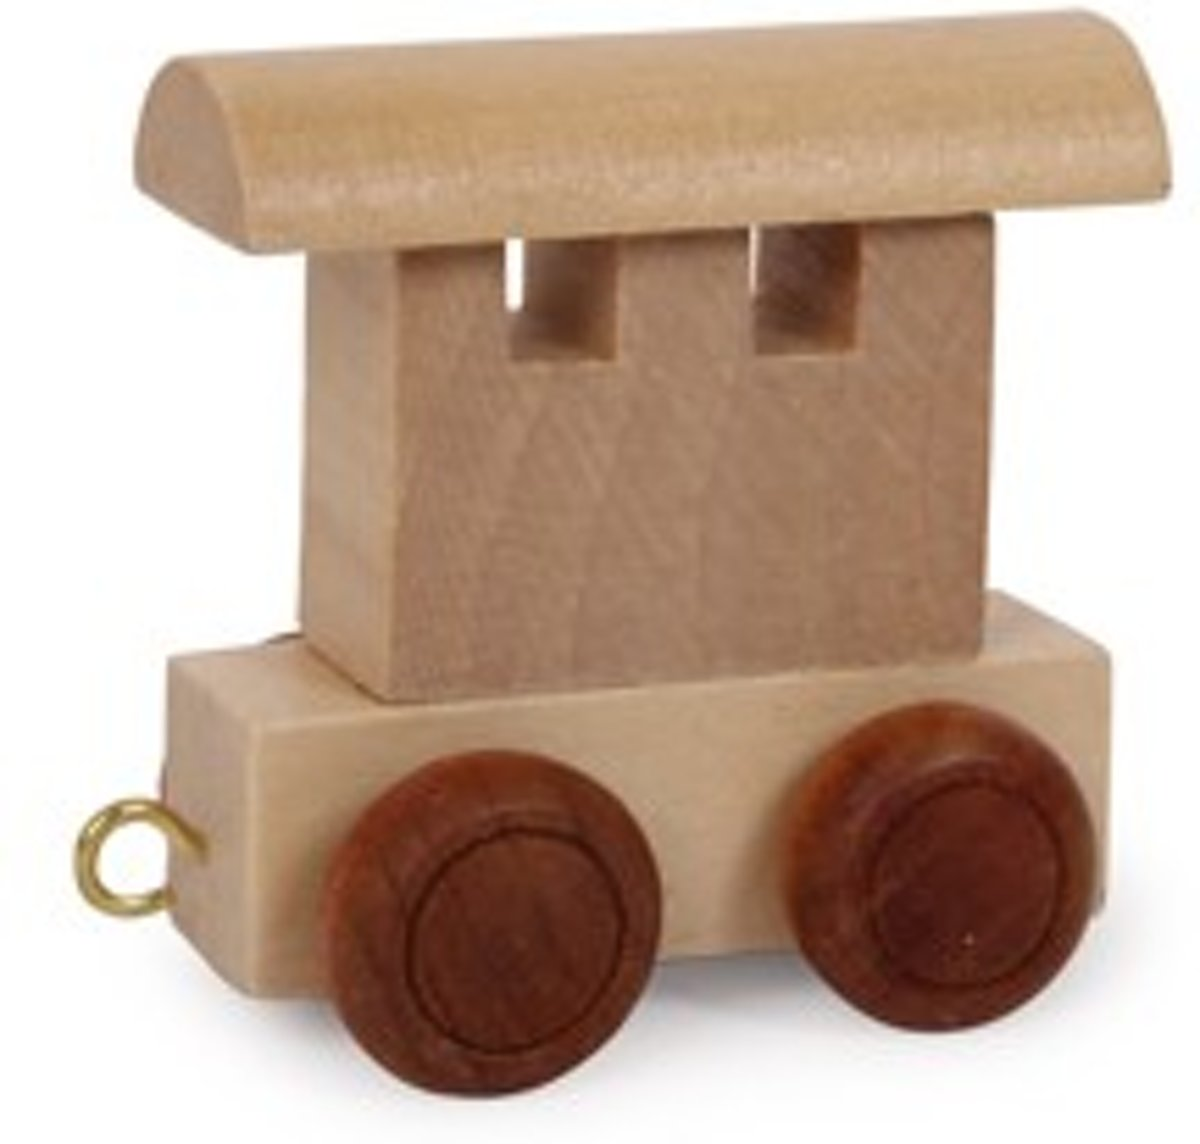 Lettertrein - Wagon - Naamtreintje babykamer - Kraamcadeau kopen